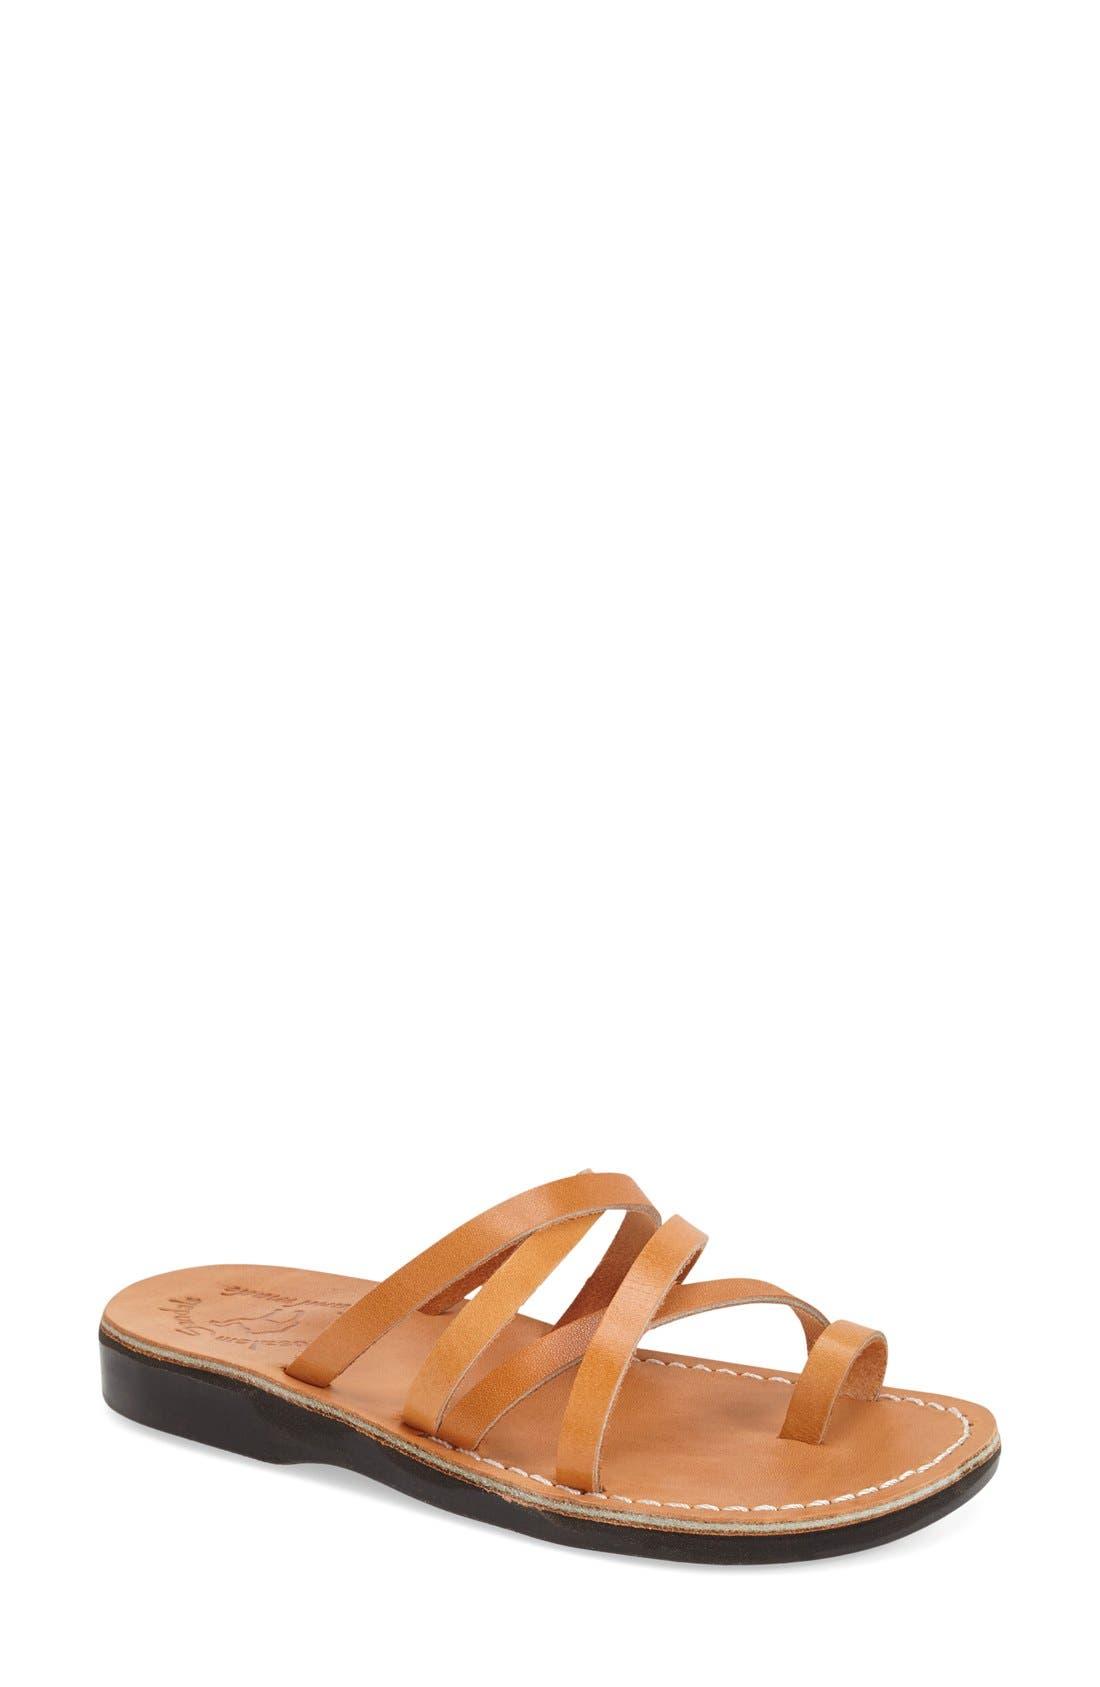 'Ariel' Strappy Slide Sandal,                         Main,                         color, 201